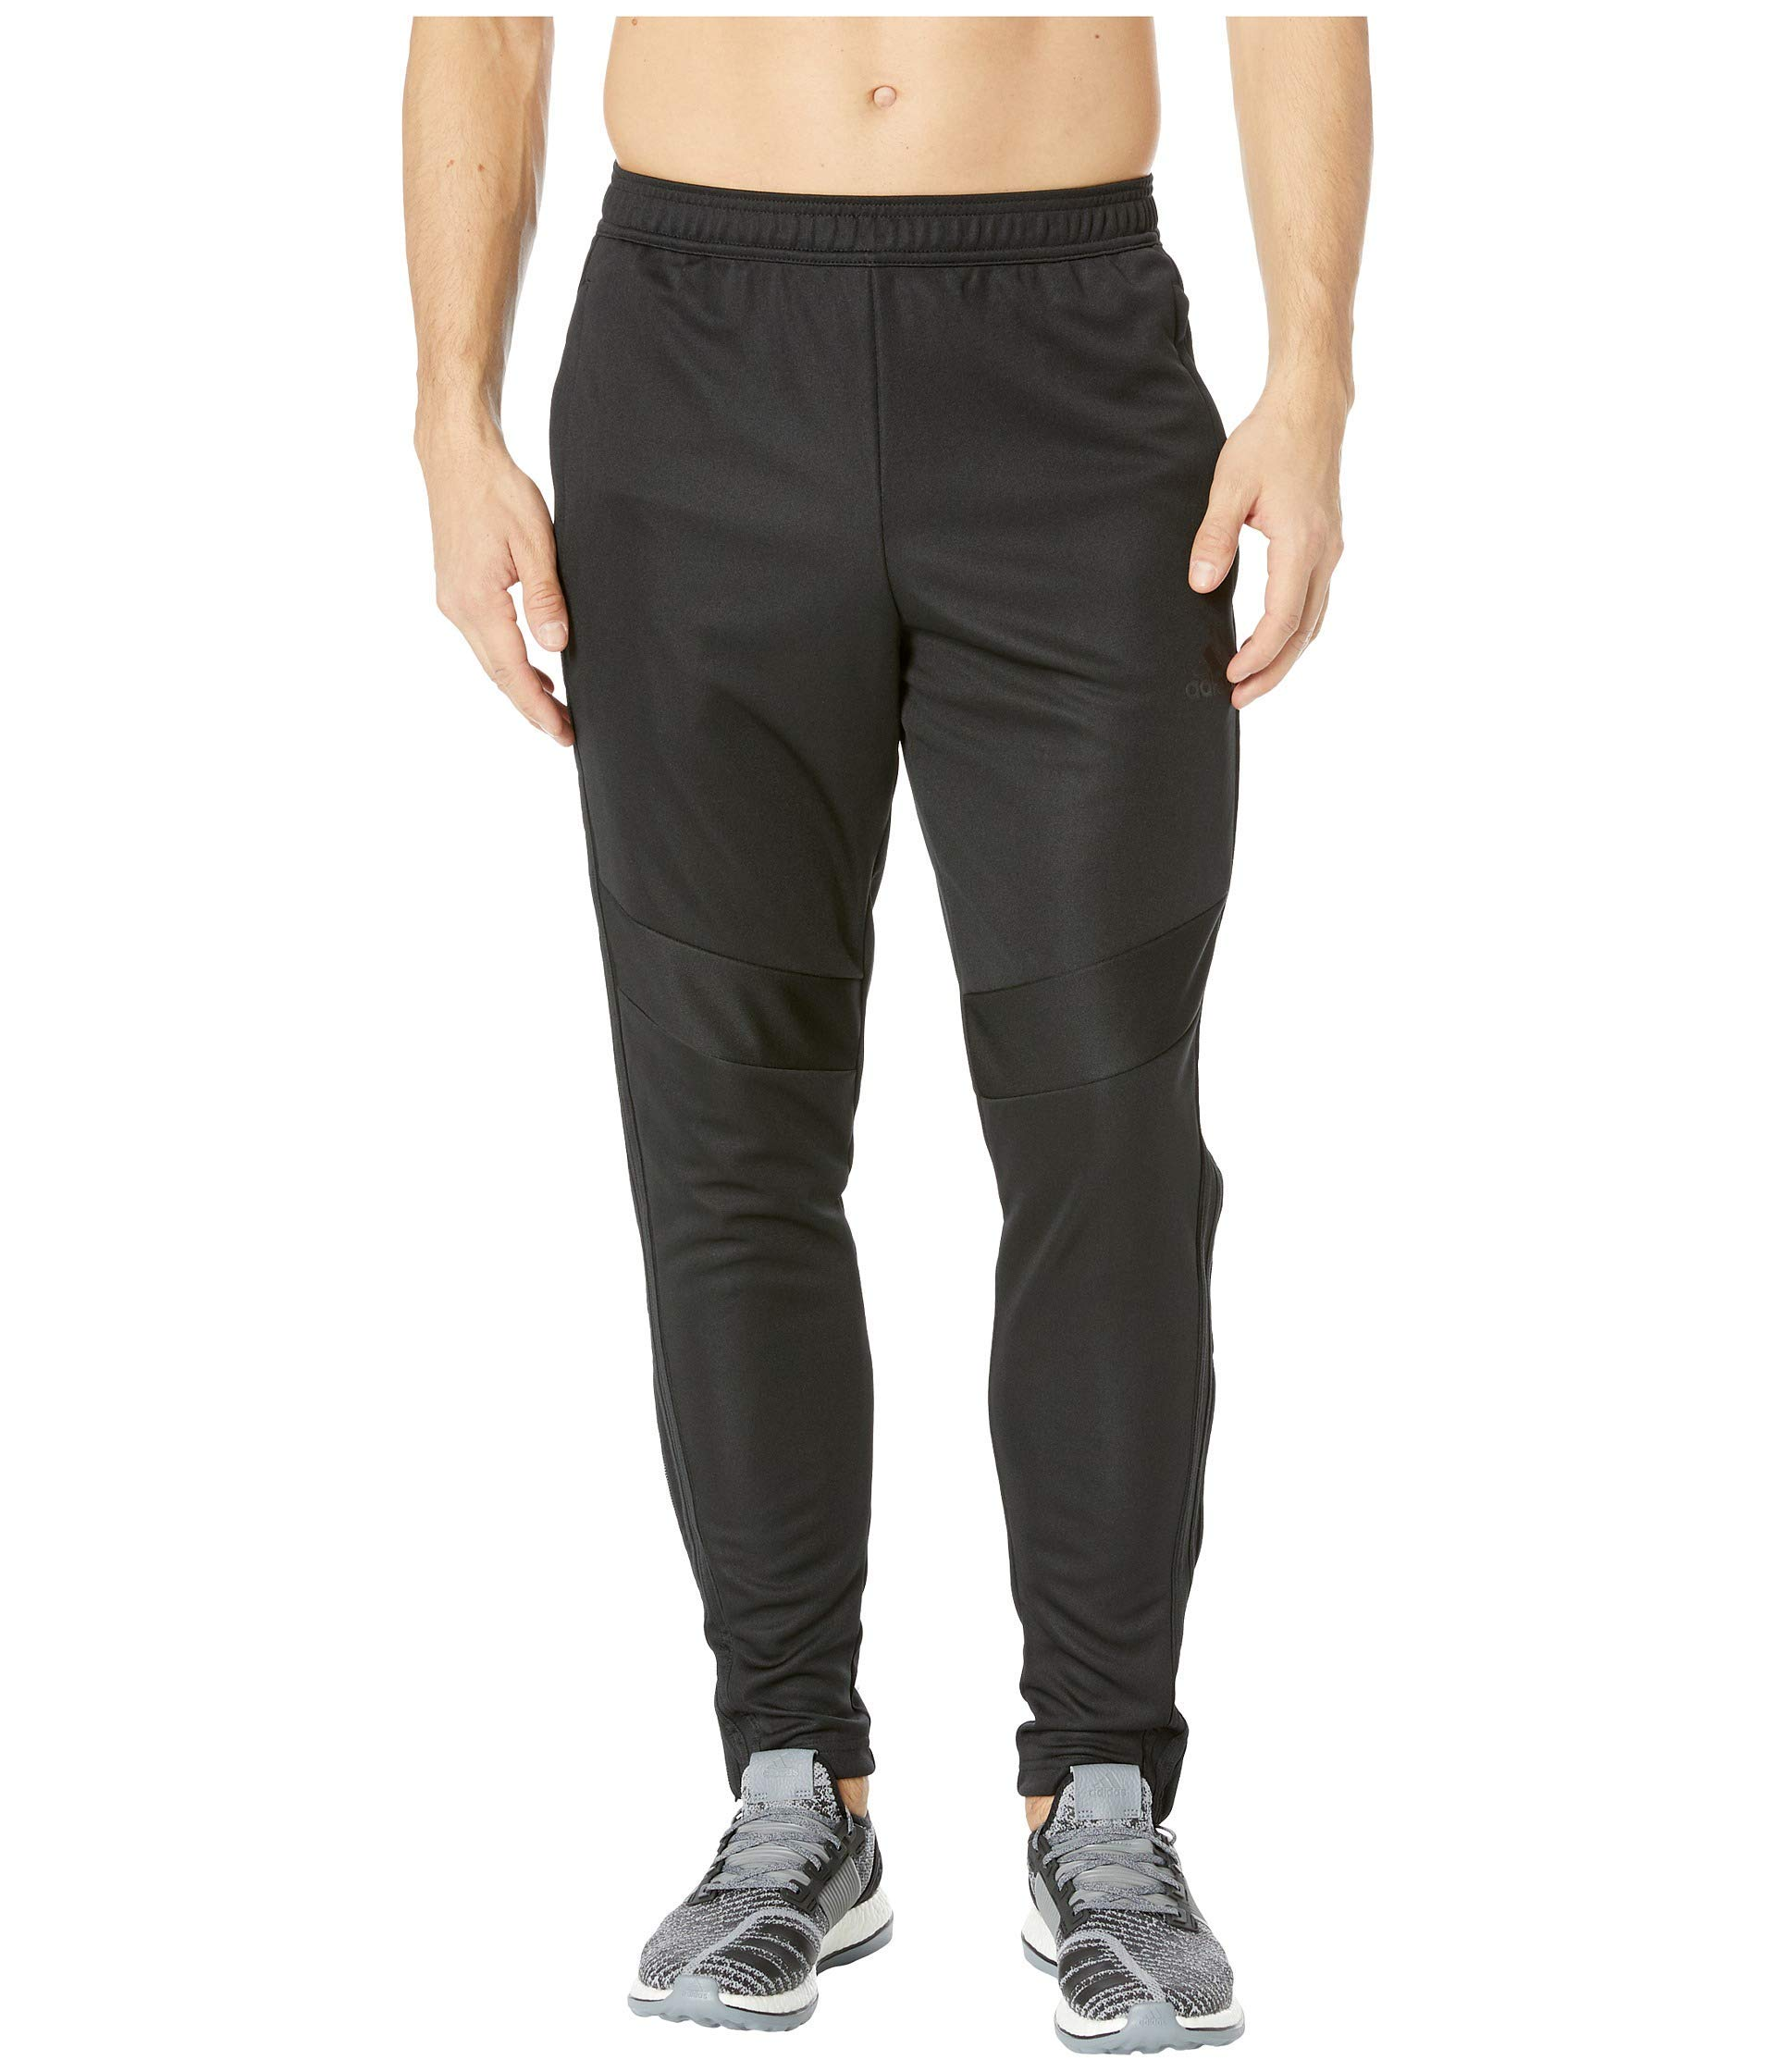 adidas Men's Soccer Tiro 19 Training Pant, Black/Black, 3X-Large